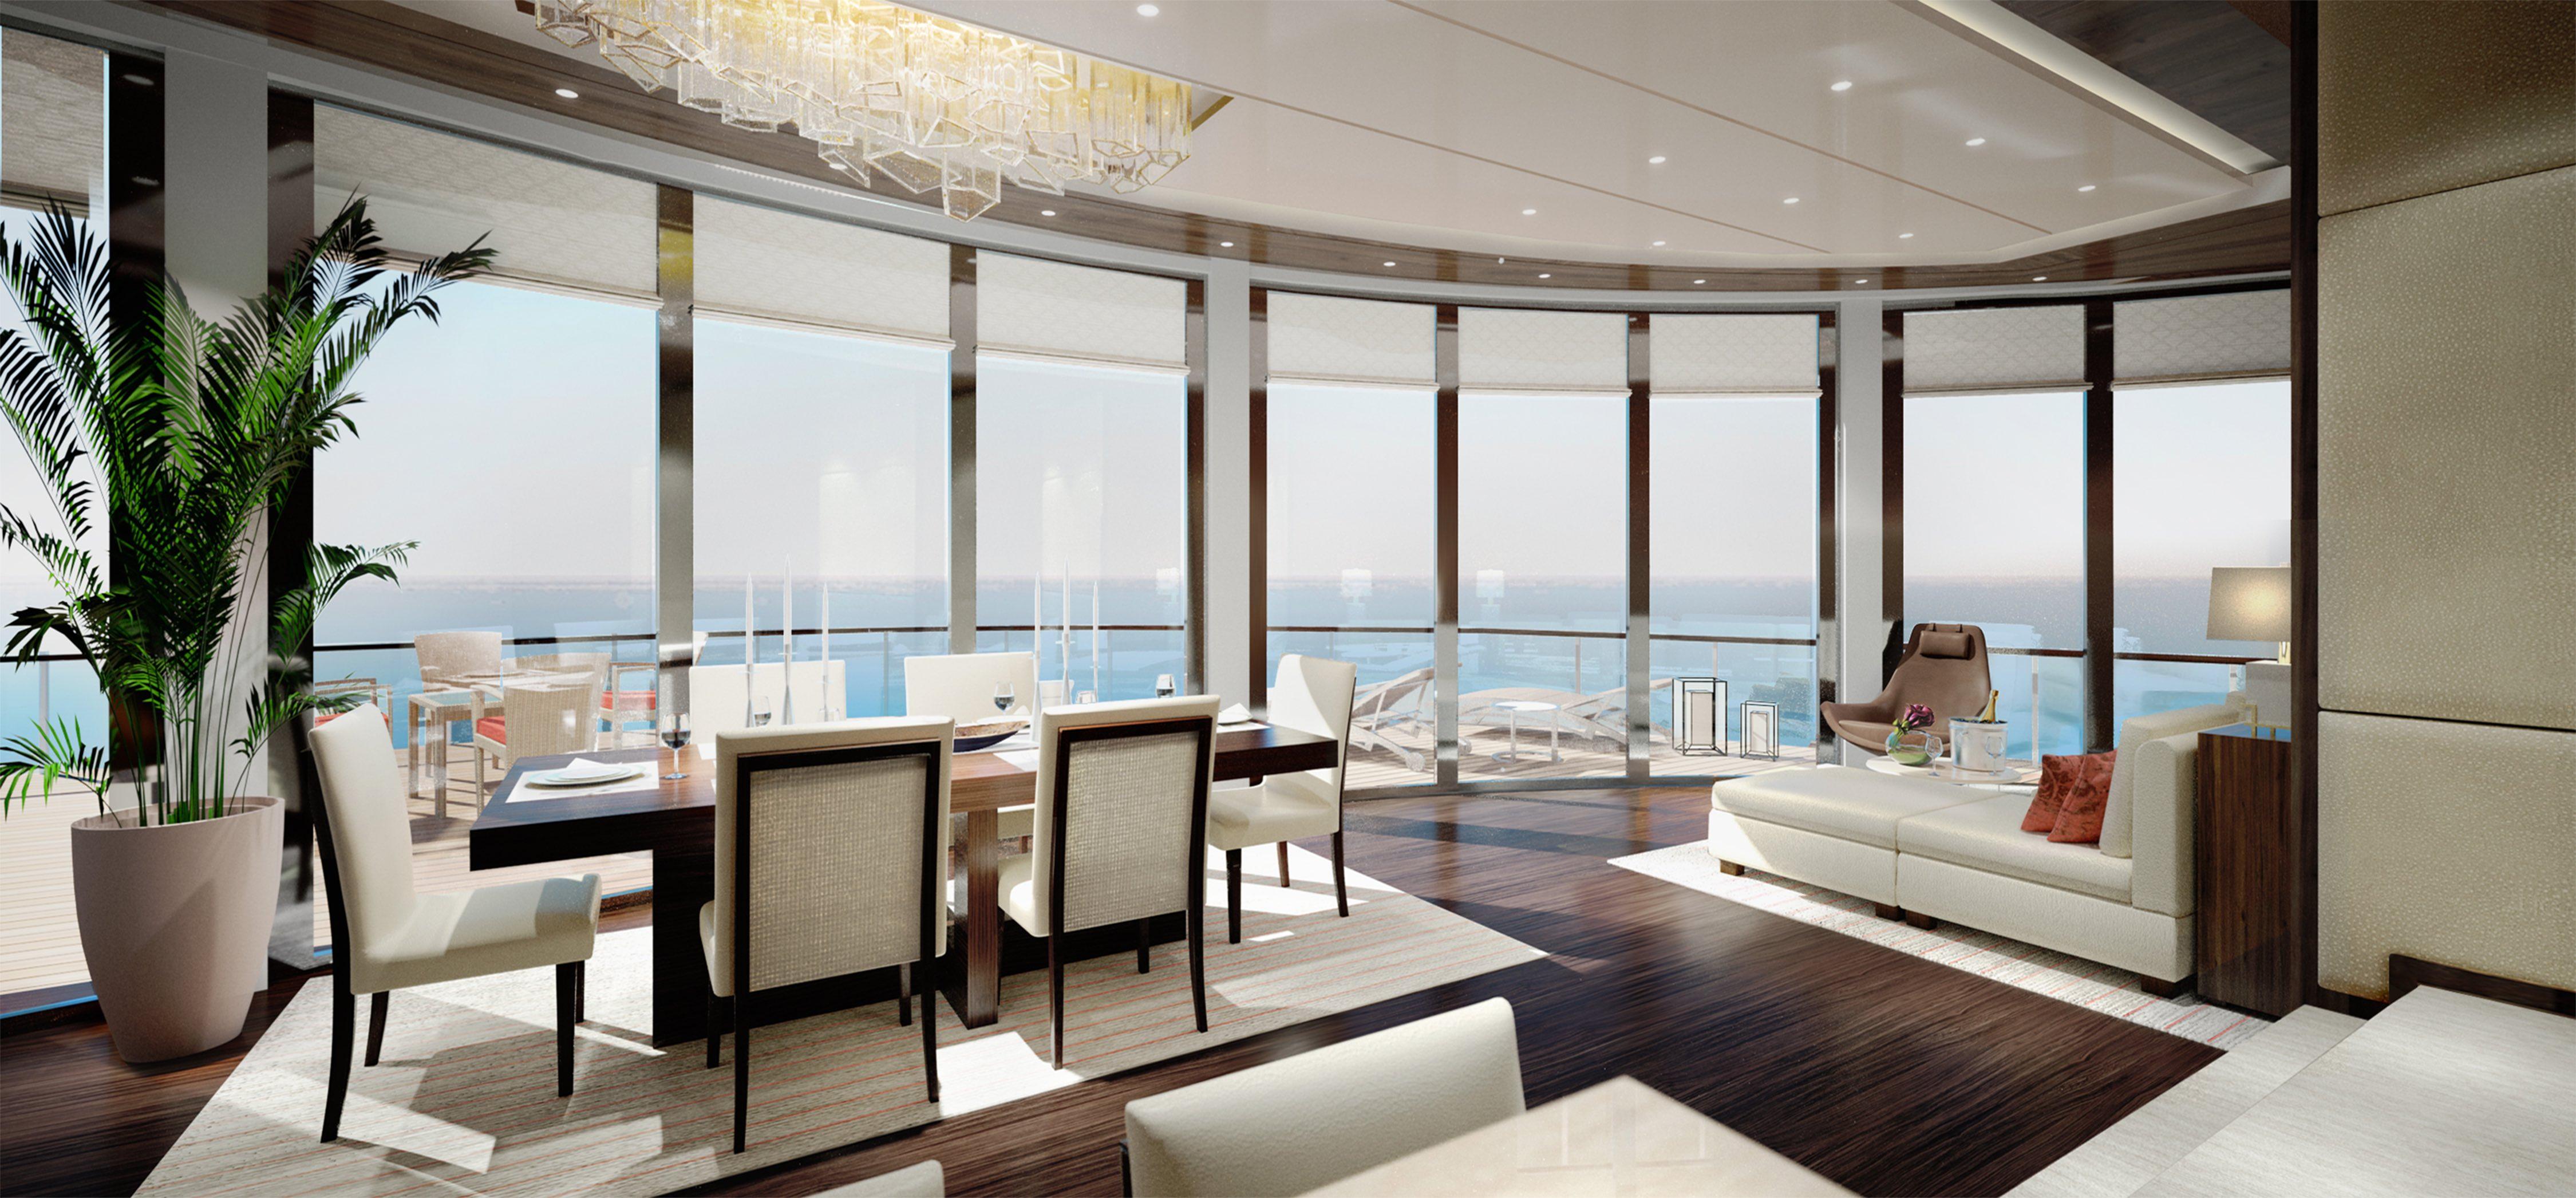 Owner's suite, Ritz-Carlton yacht